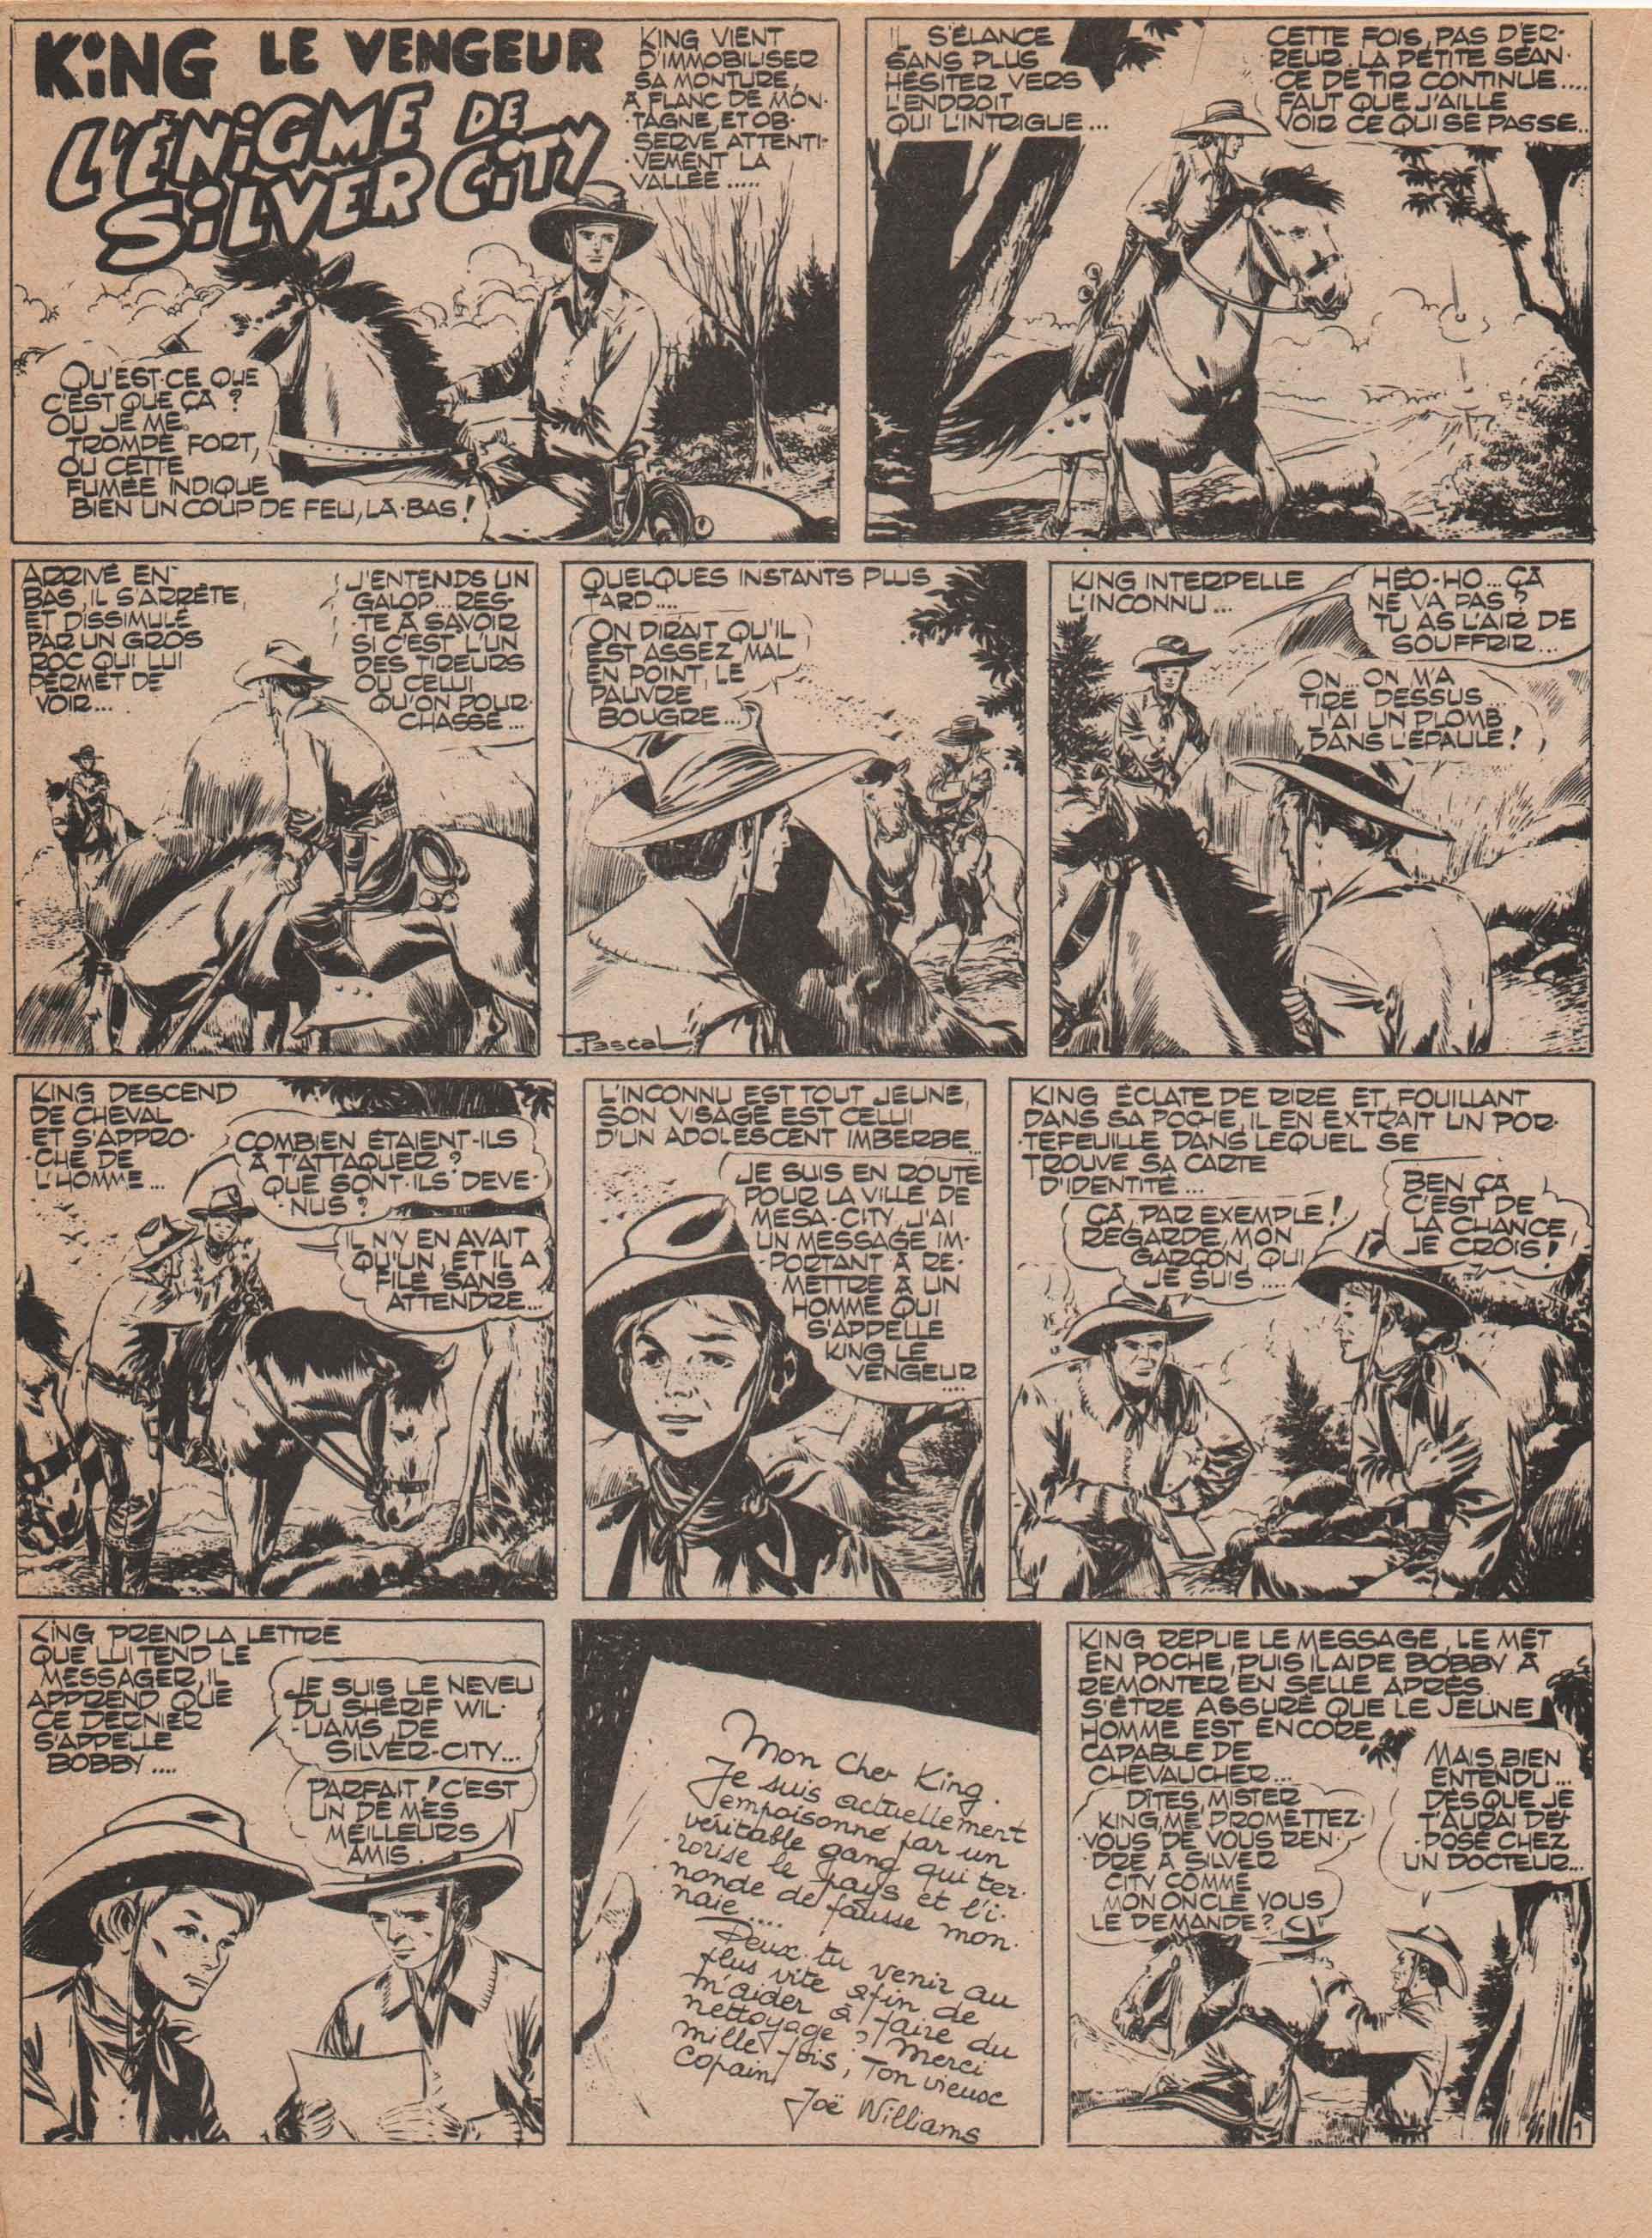 « King le vengeur » Audax n° 41 (mars 1956).